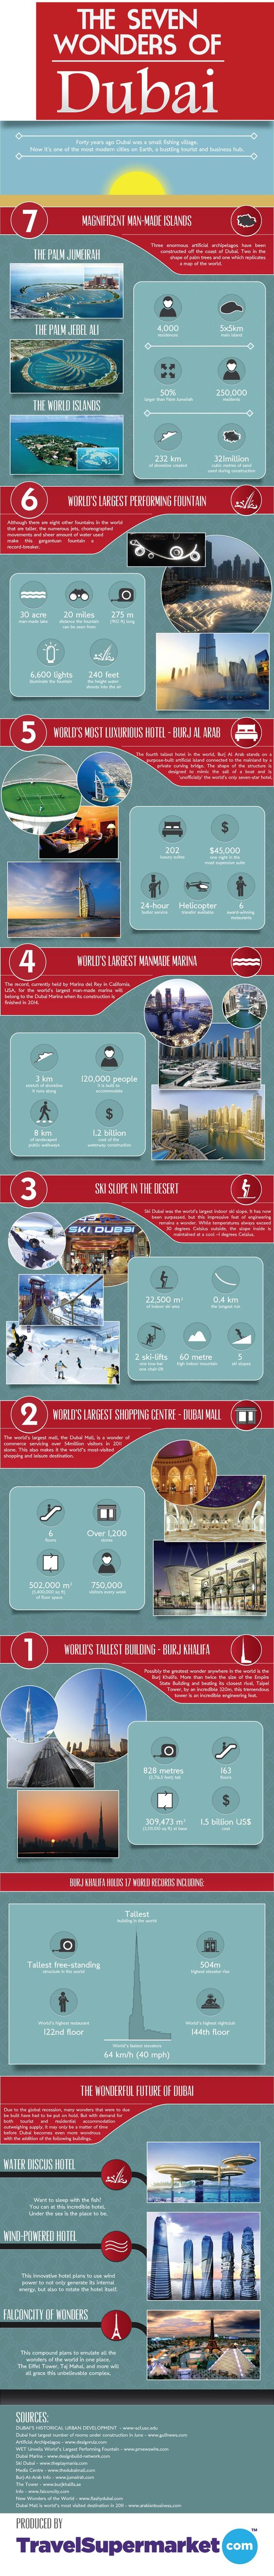 The Seven Wonders of Dubai